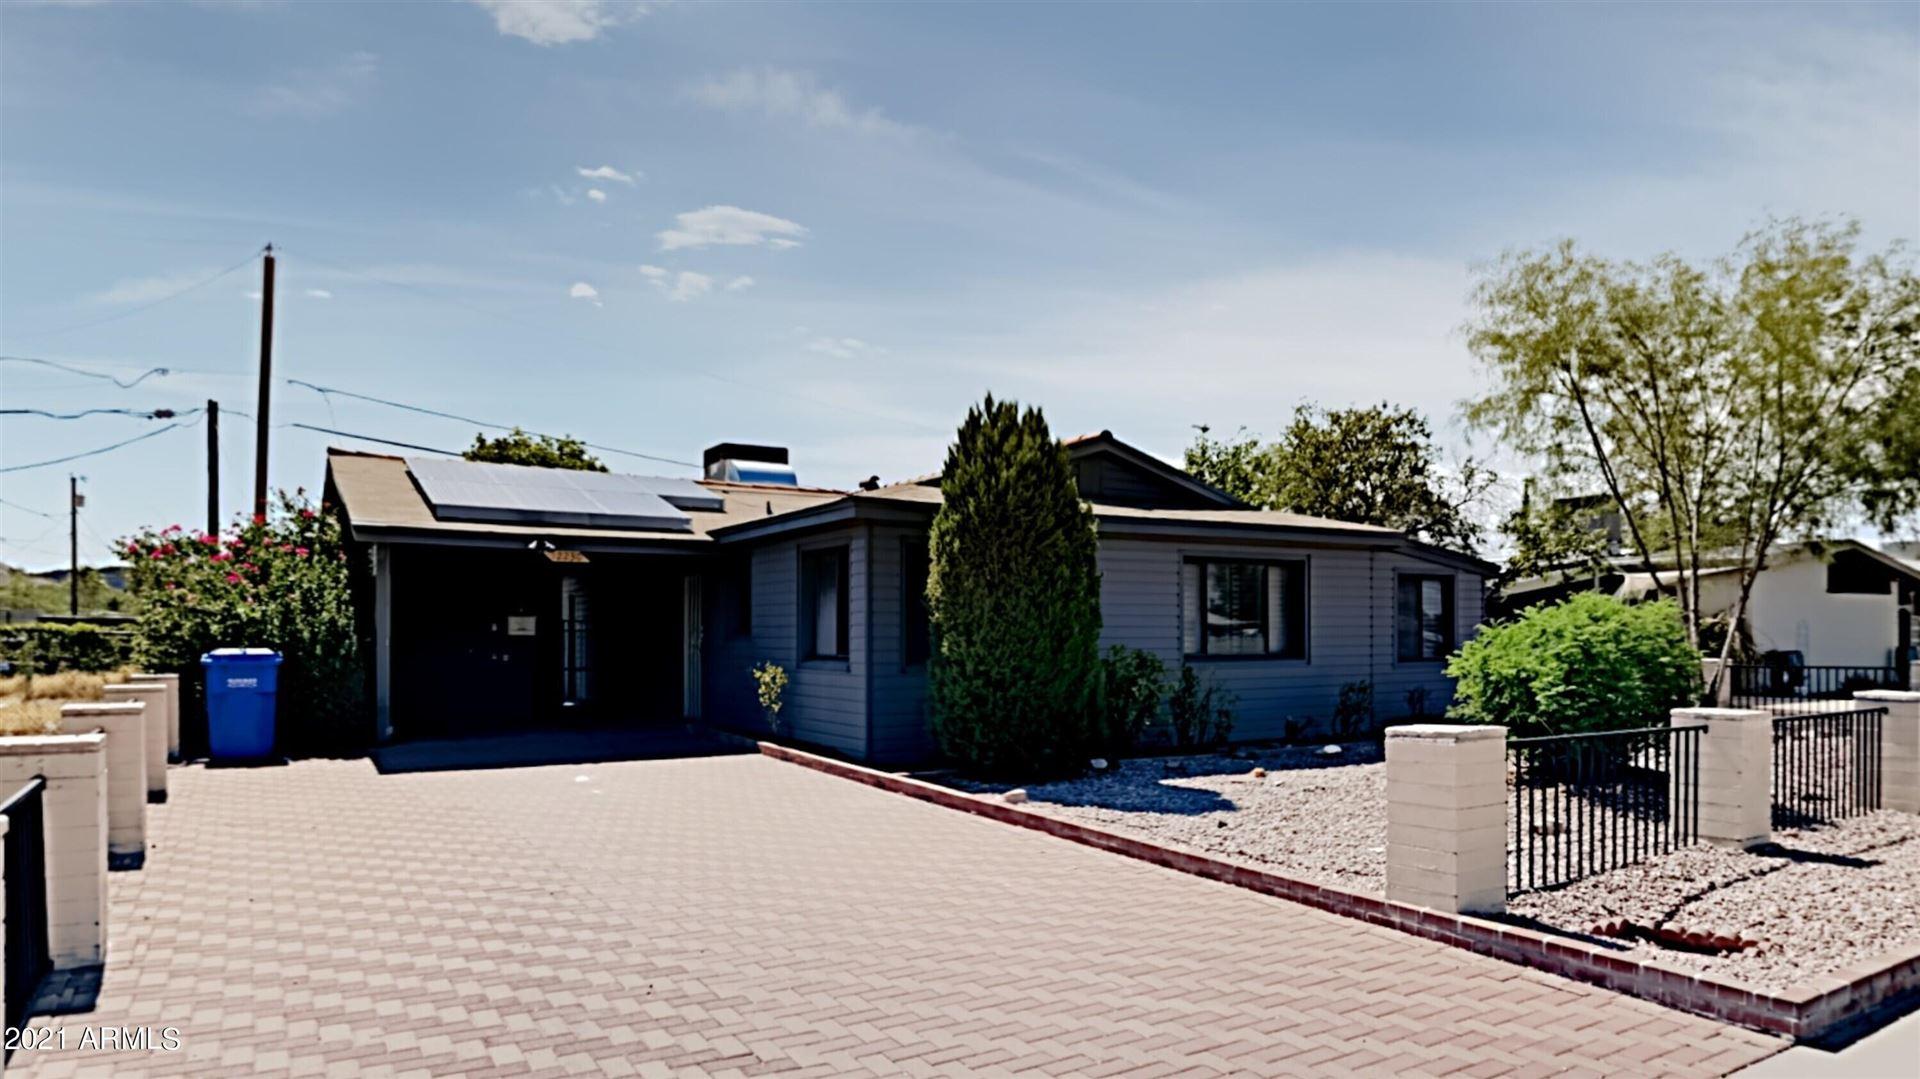 12230 N 23RD Street, Phoenix, AZ 85022 - MLS#: 6258061